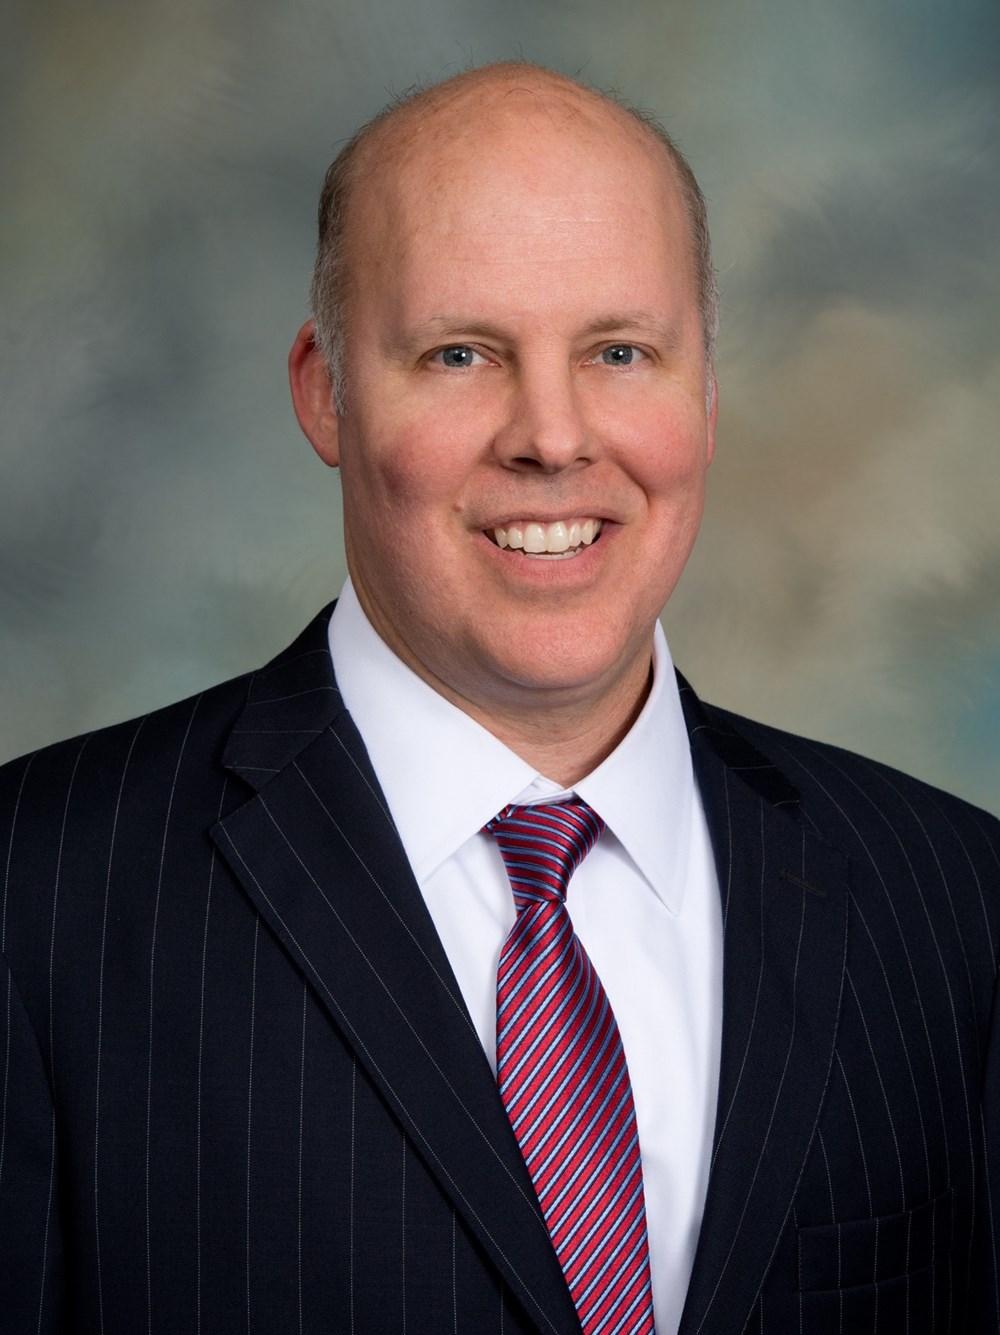 James C  Major, Jr , MD, PhD, Retinal Surgeon